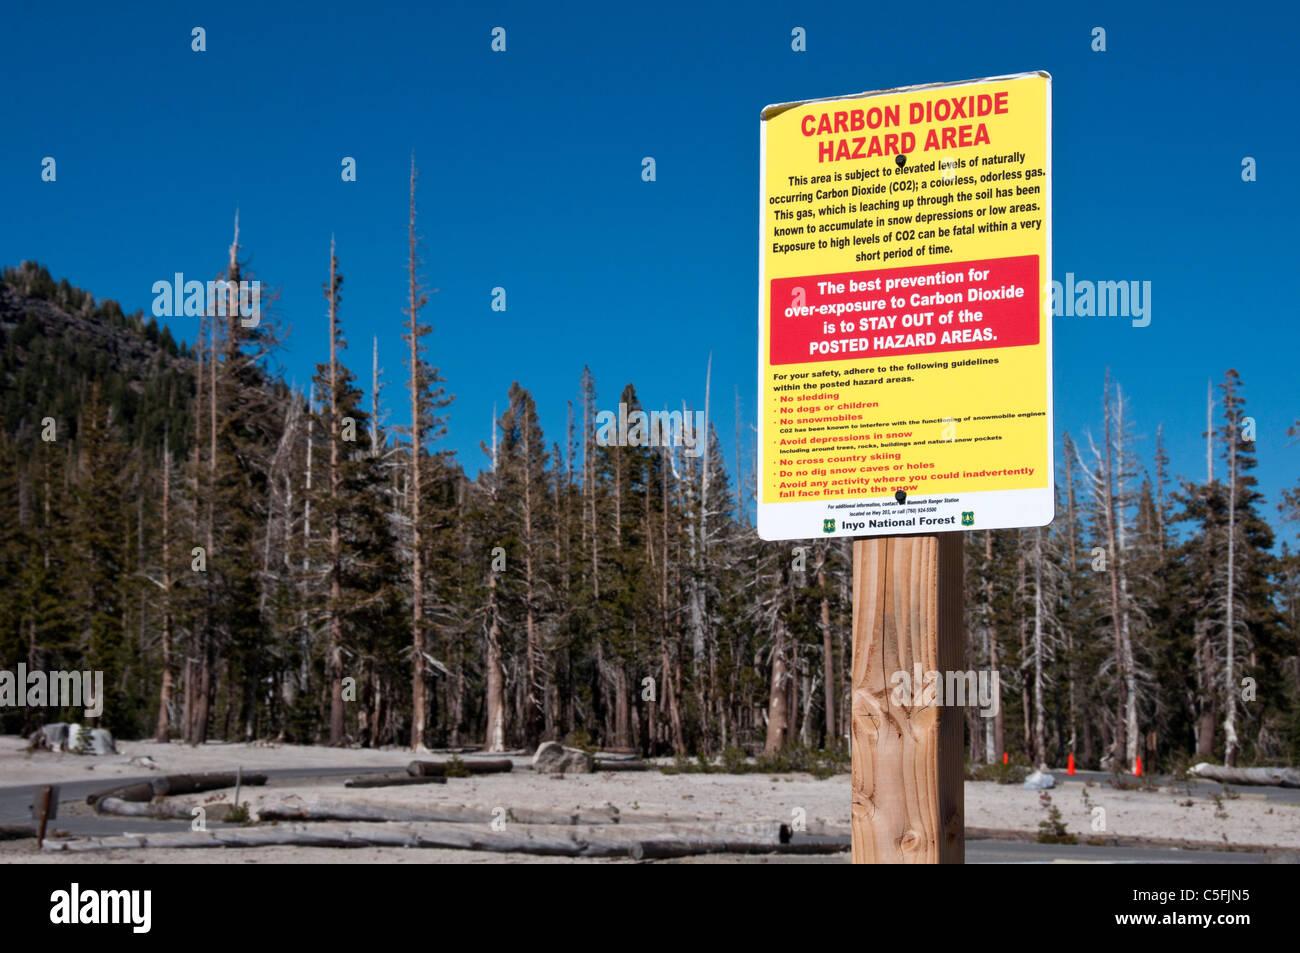 Carbon Dioxide hazard sign - Stock Image